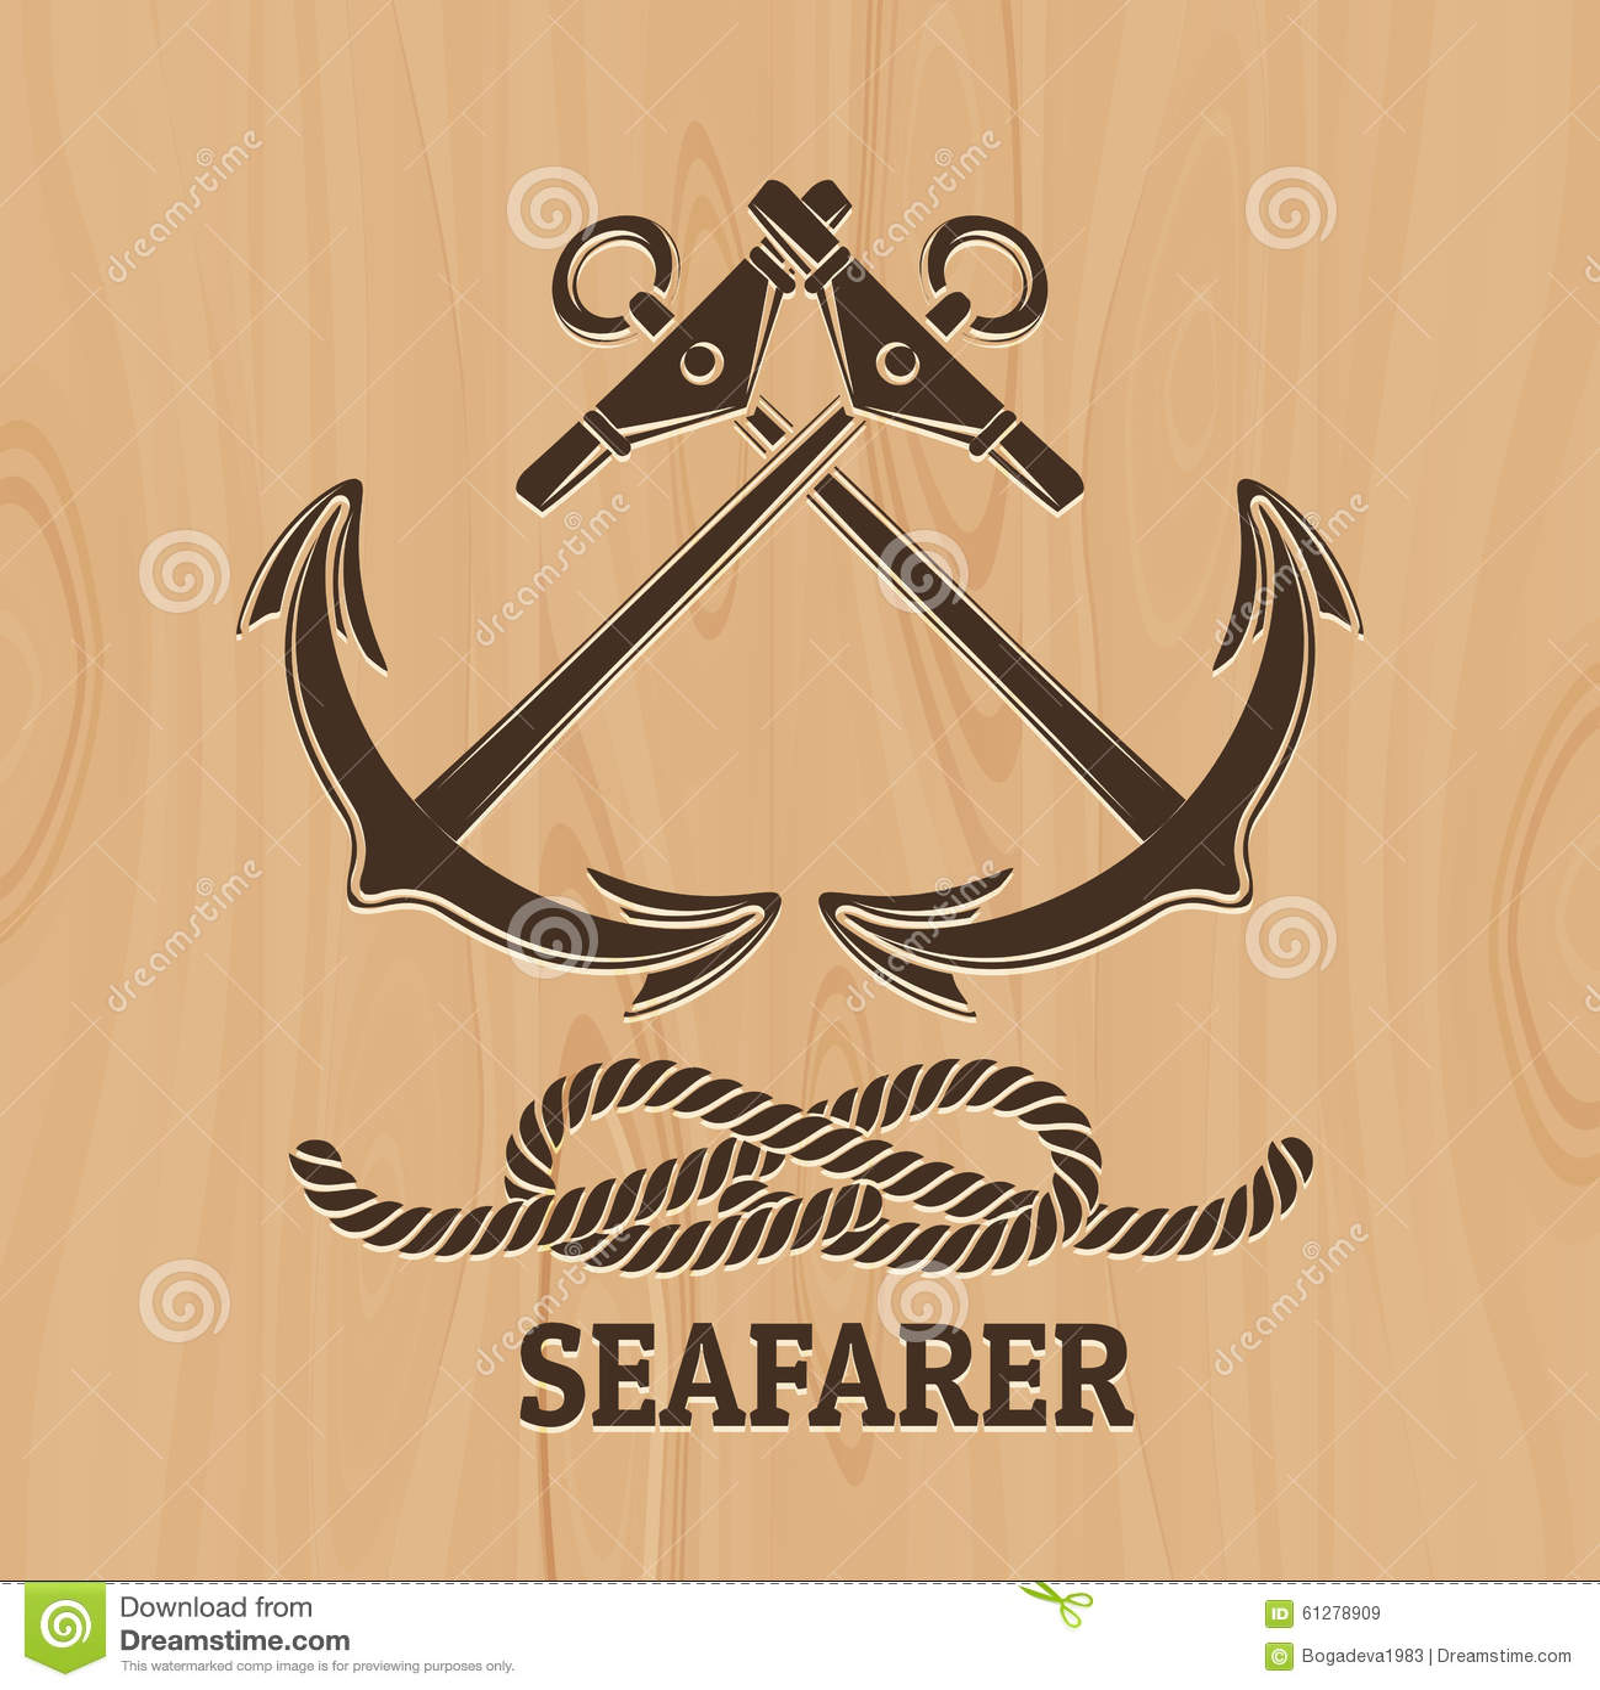 seafarer cartoons  illustrations  u0026 vector stock images